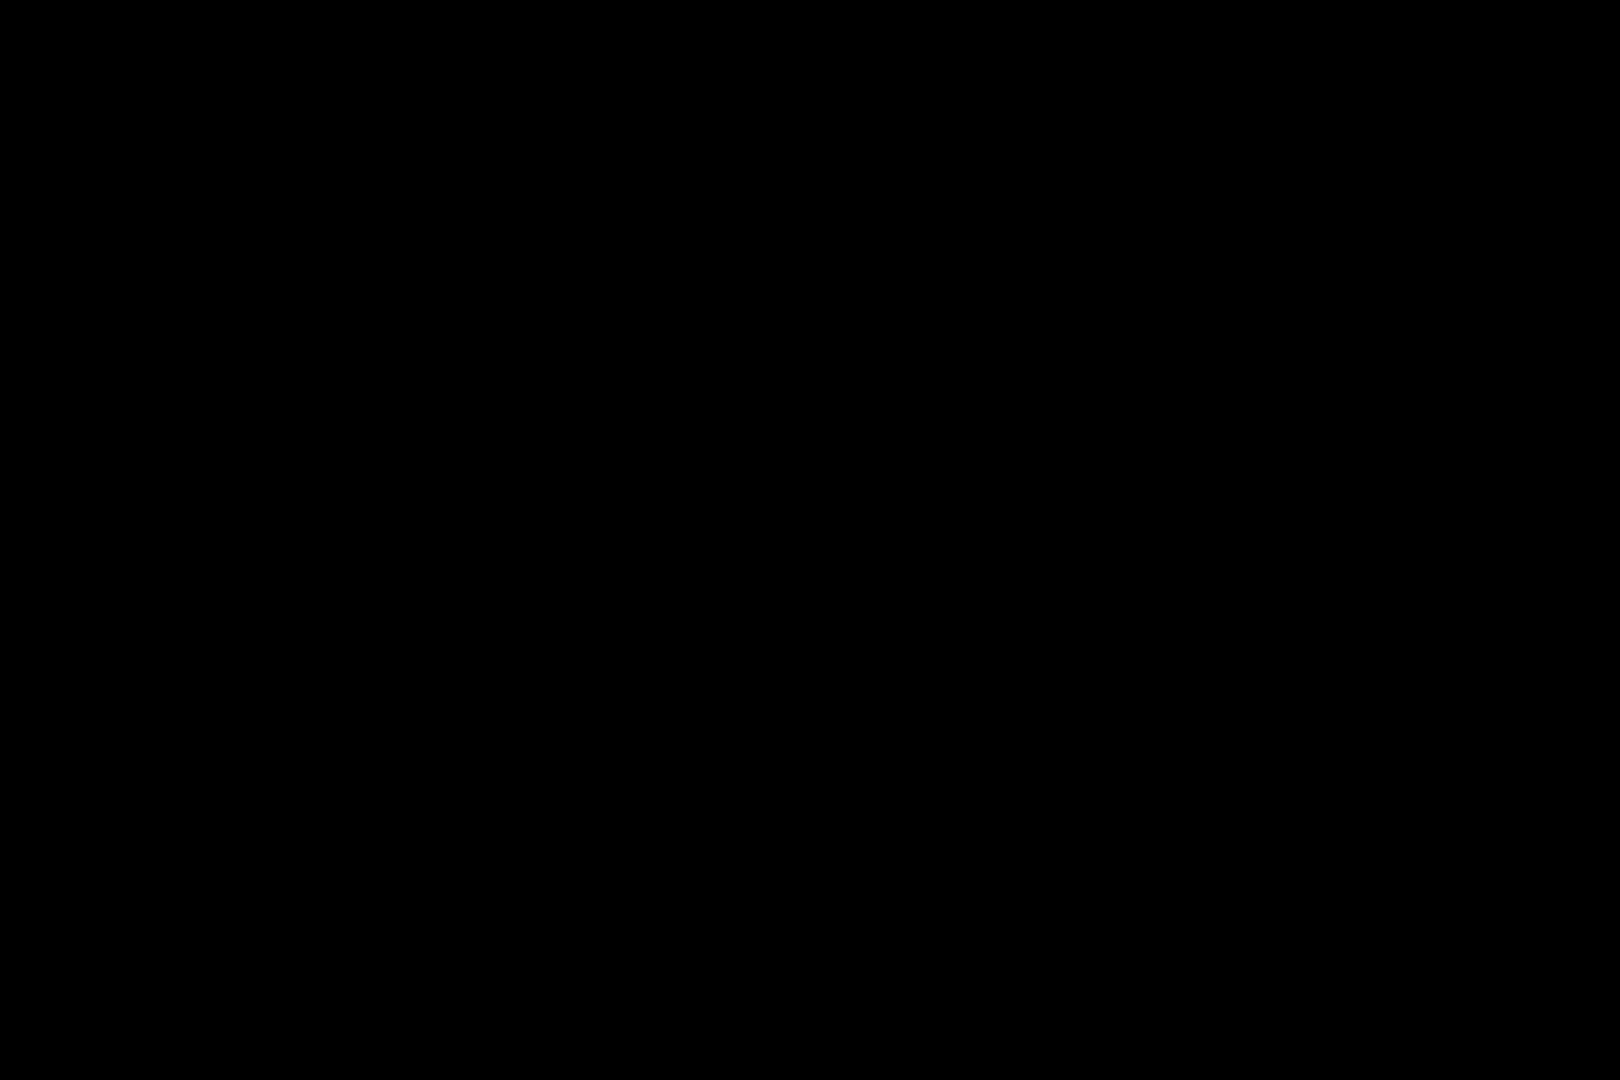 充血監督の深夜の運動会Vol.130 赤外線 セックス無修正動画無料 70PIX 43